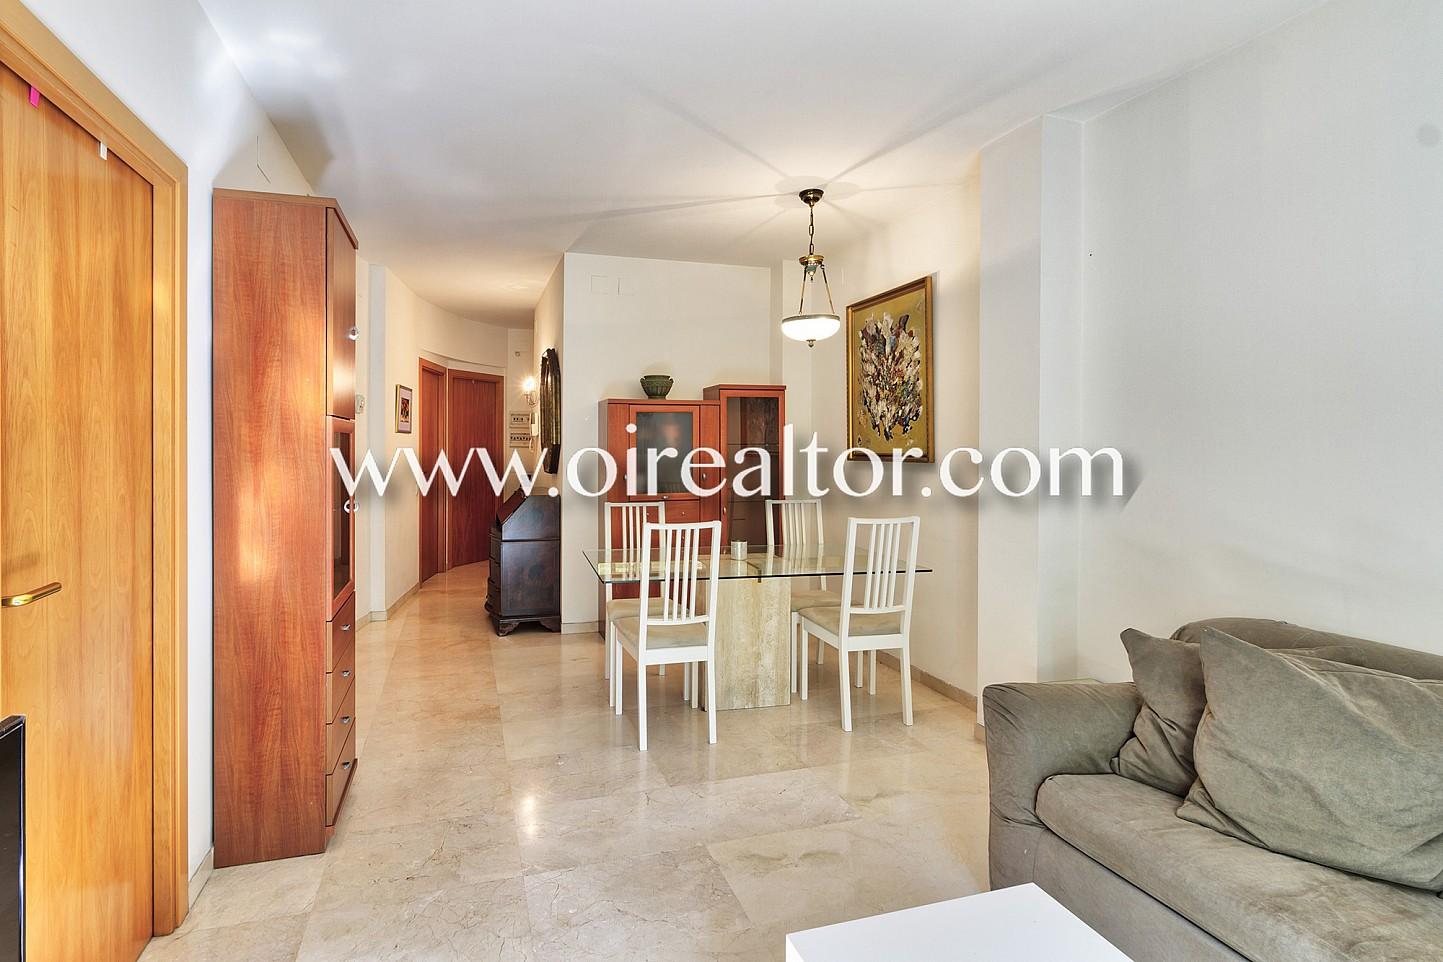 Alquiler de lujo en sagrada familia barcelona oi realtor - Alquiler de apartamentos por dias en barcelona ...